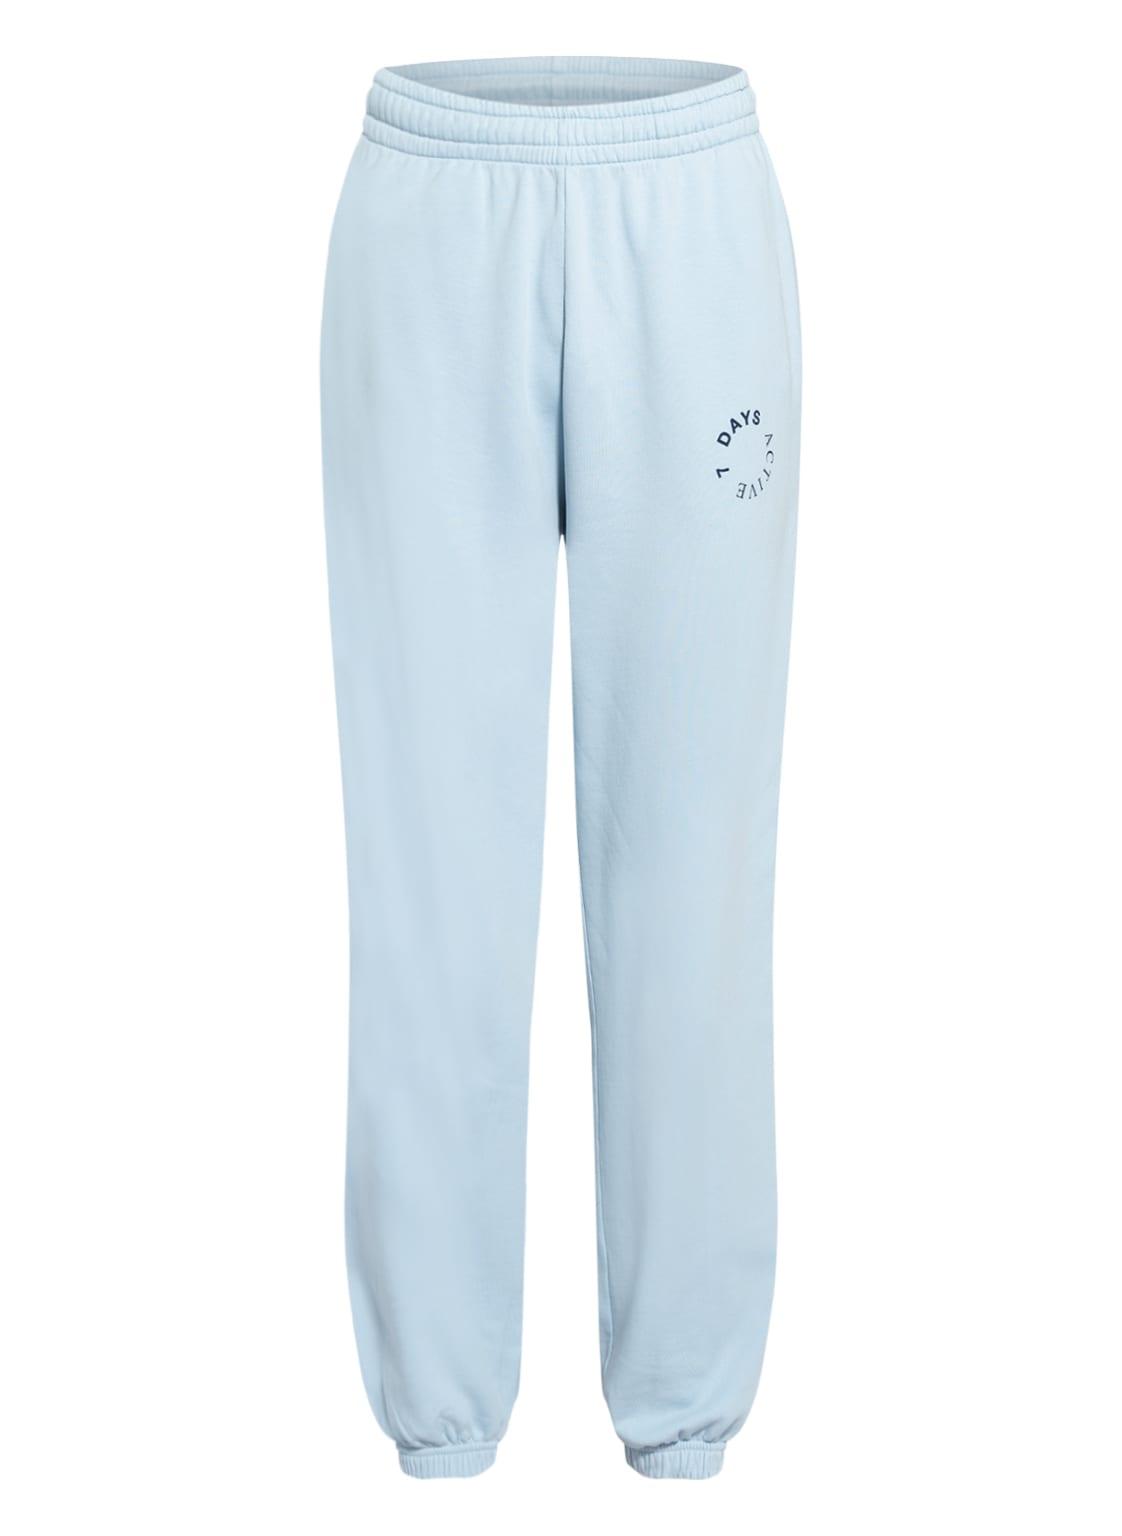 Image of 7 Days Active Sweatpants Monday blau